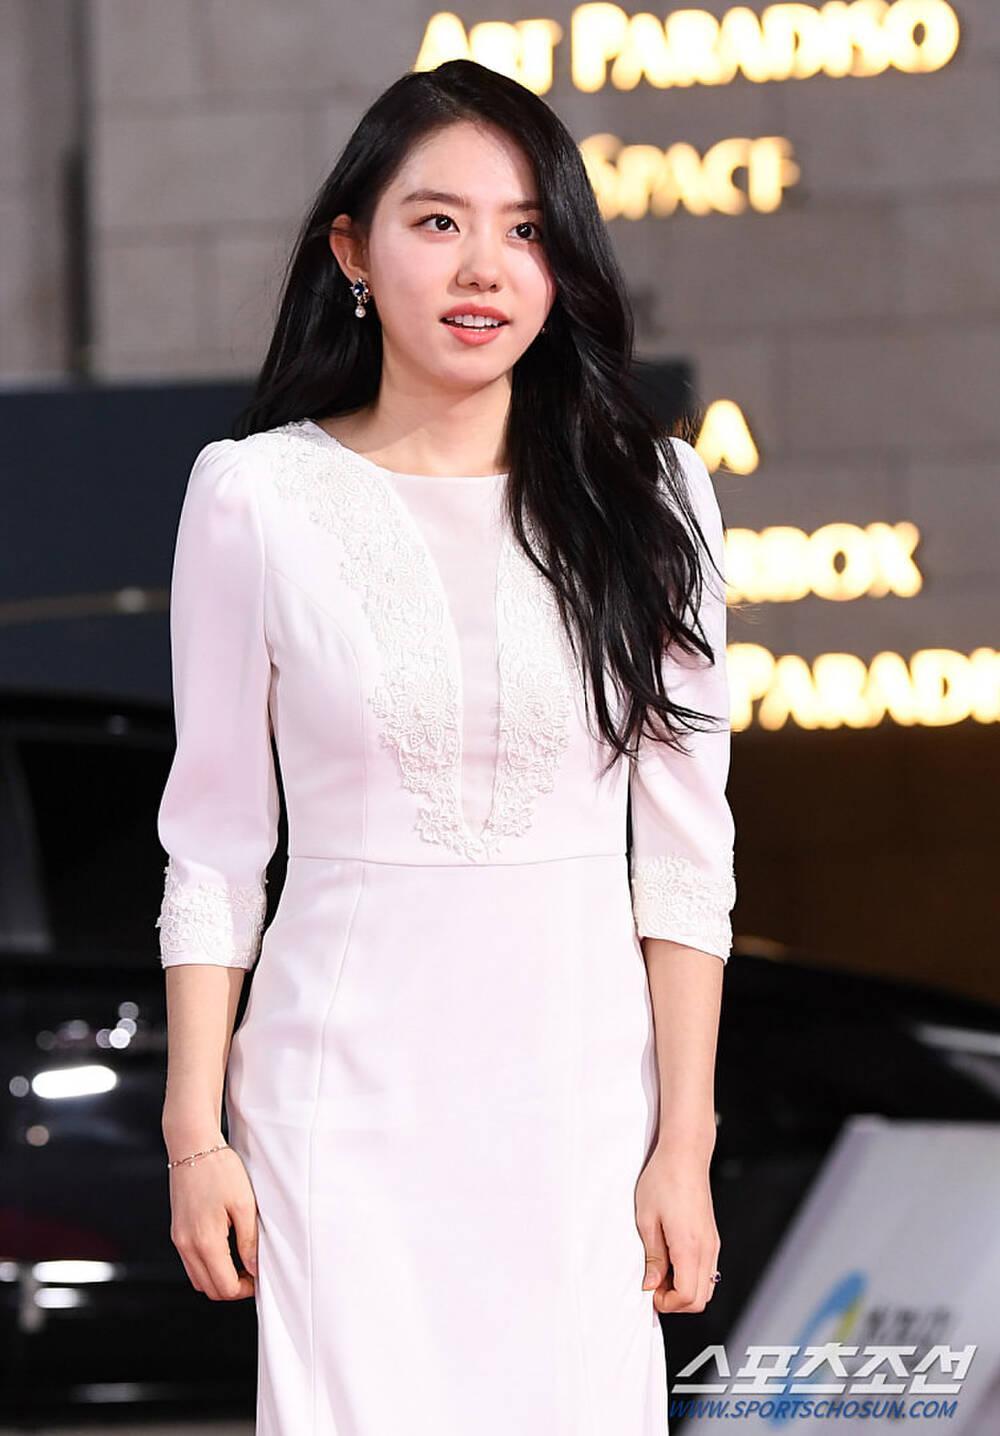 Thảm đỏ 'Rồng xanh 2020': Shin Hye Sun 'cân sắc' Shin Min Ah, Jung Woo Sung - Lee Byung Hun điển trai! Ảnh 42